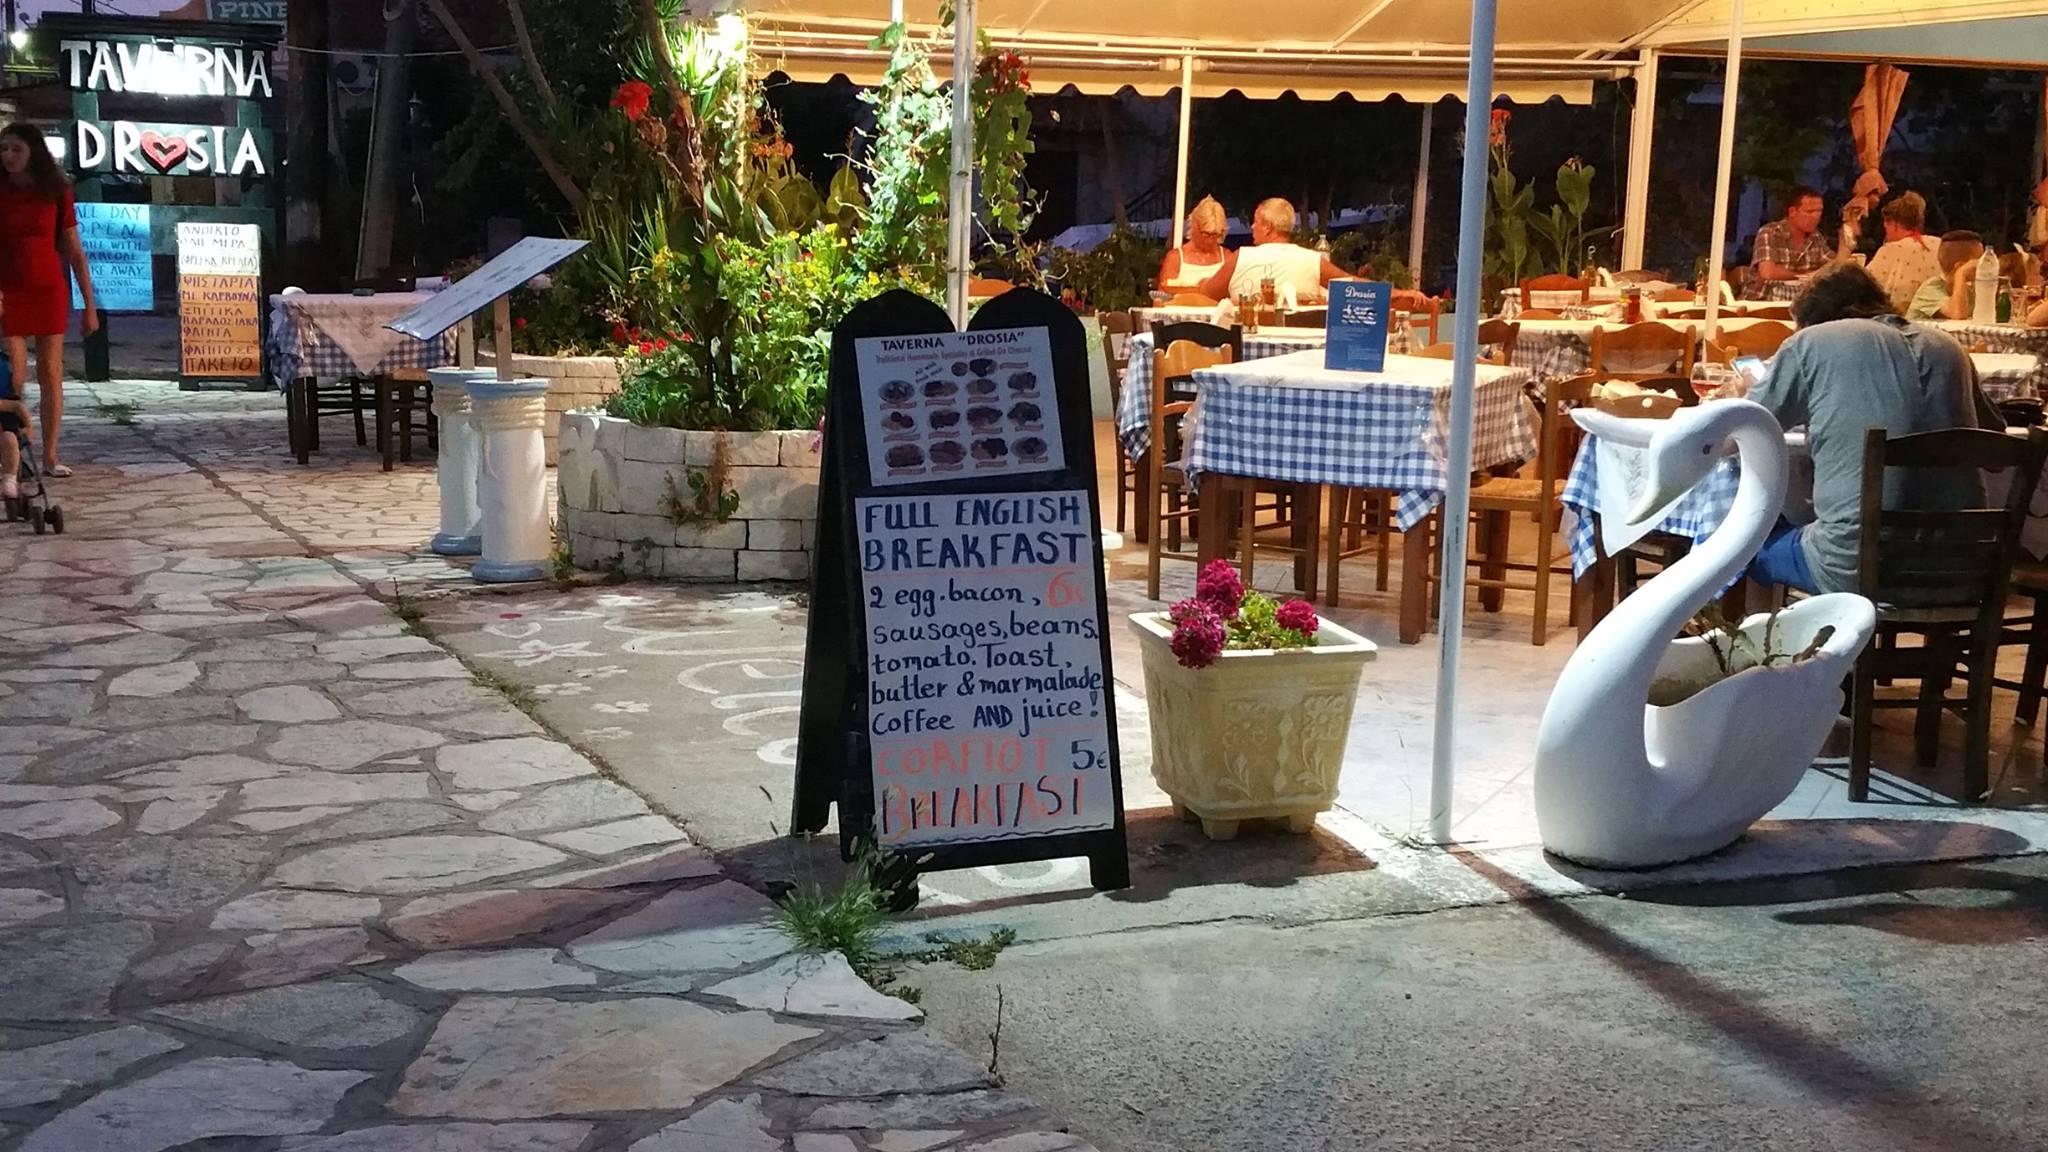 Taverna Drosia - Roda, Corfu